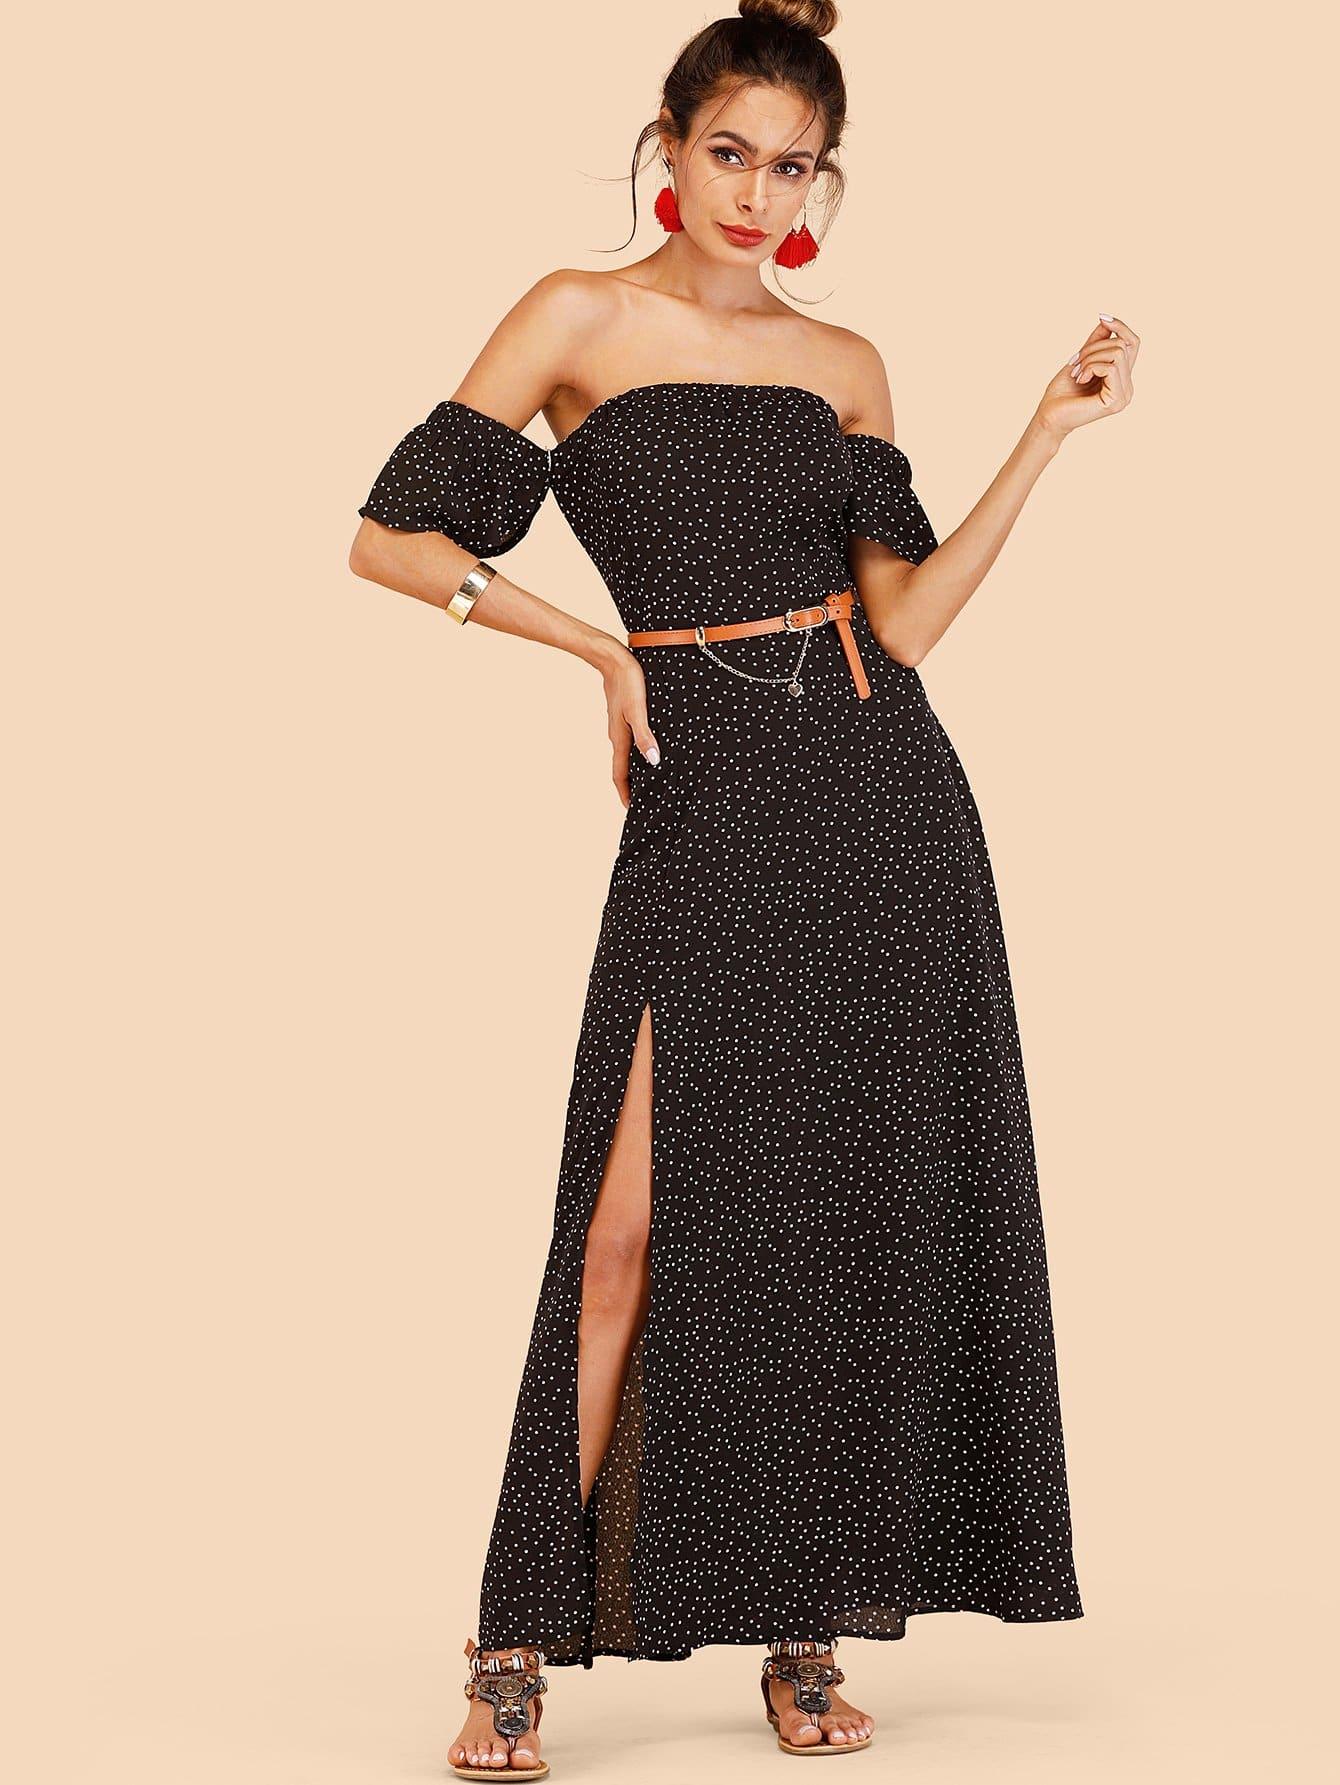 Off Shoulder Polka Dots Dress With Belt drop shoulder marled sweatshirt dress with corset belt